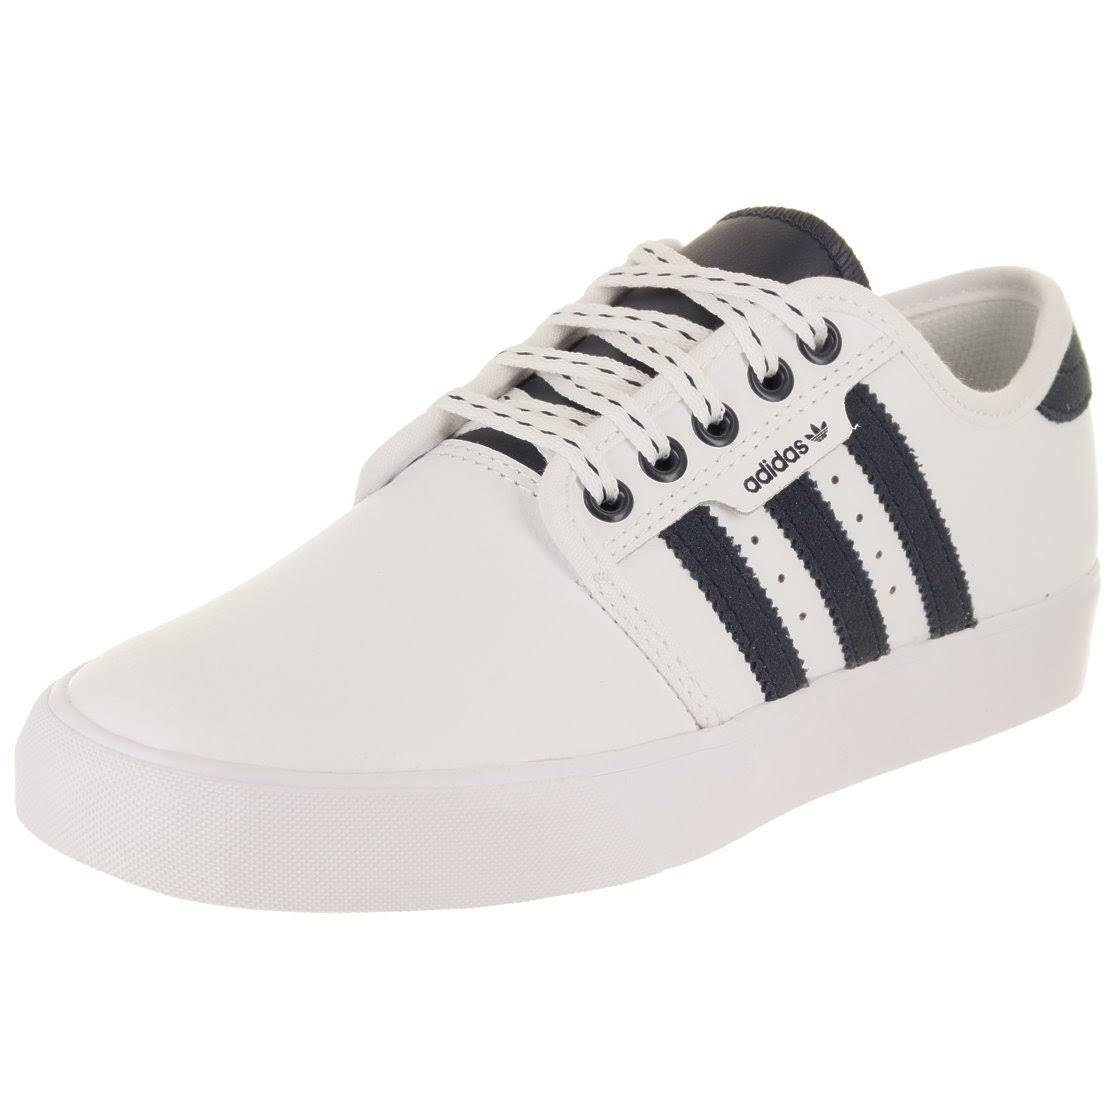 Goma Colegial J Skate De Marino 7 Seeley Azul 4 Kids Blanco Adidas Zapatillas fXnPxX